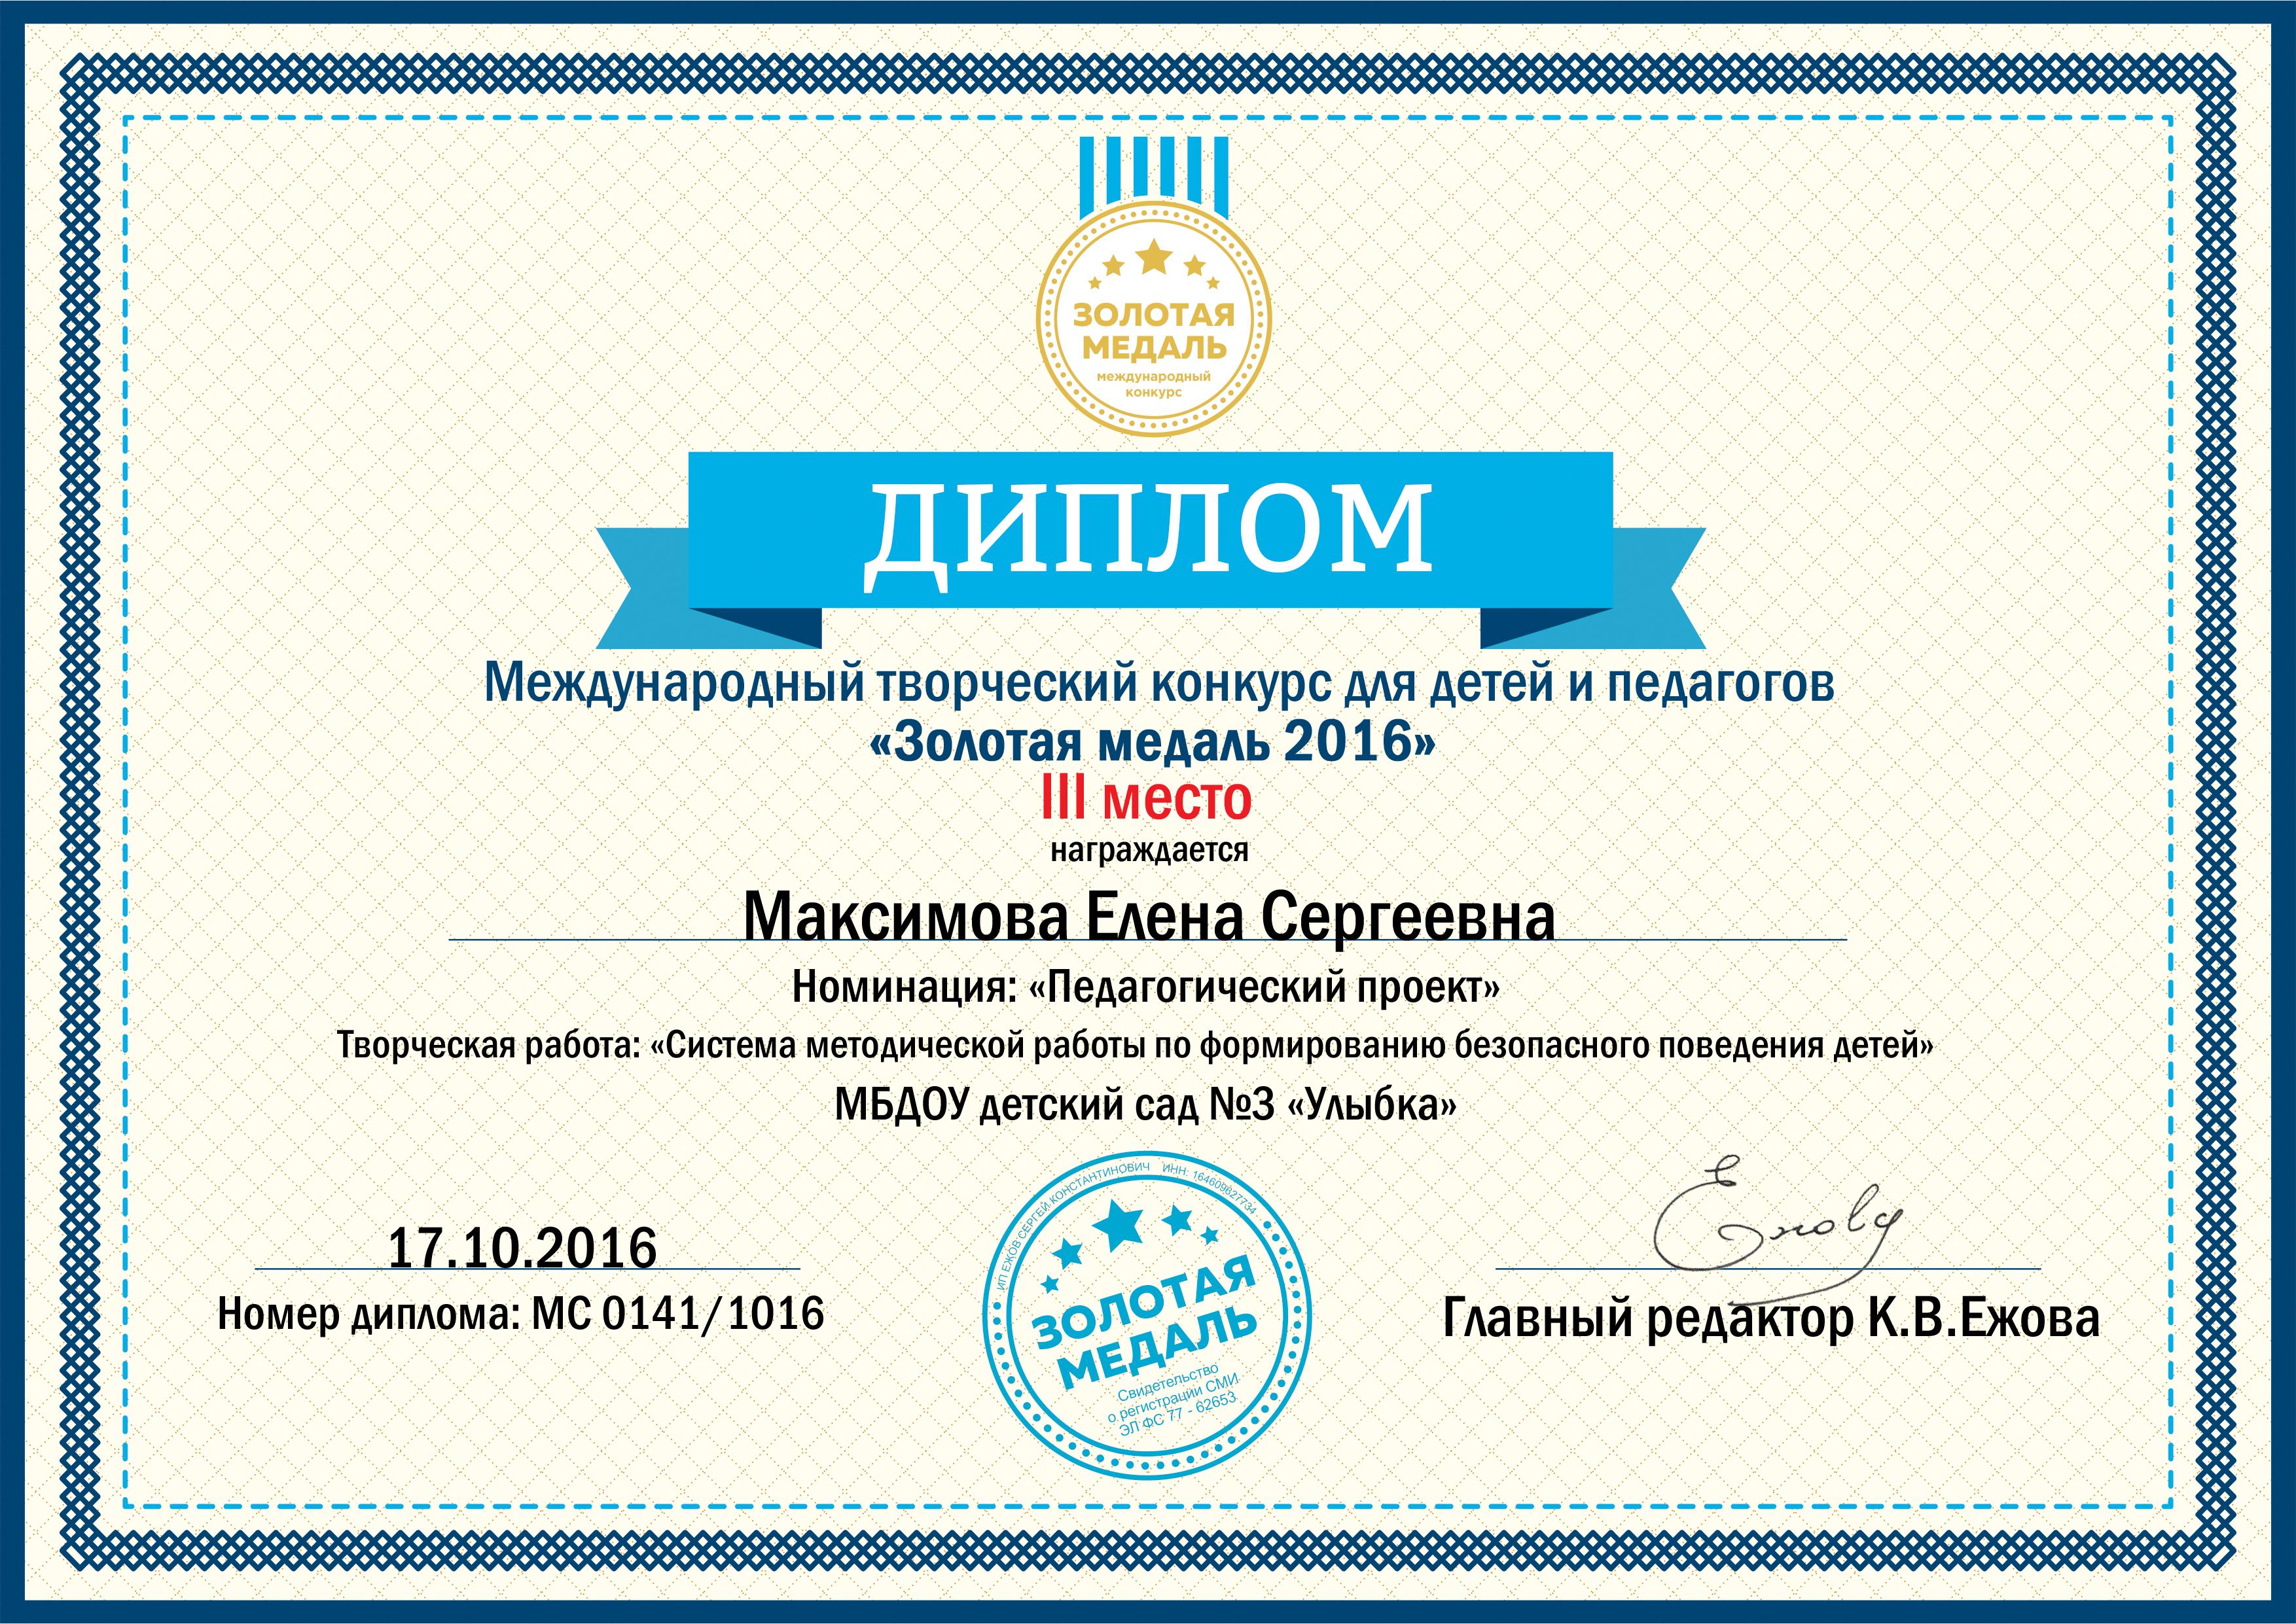 Максимова-Елена-Сергеевна.jpg